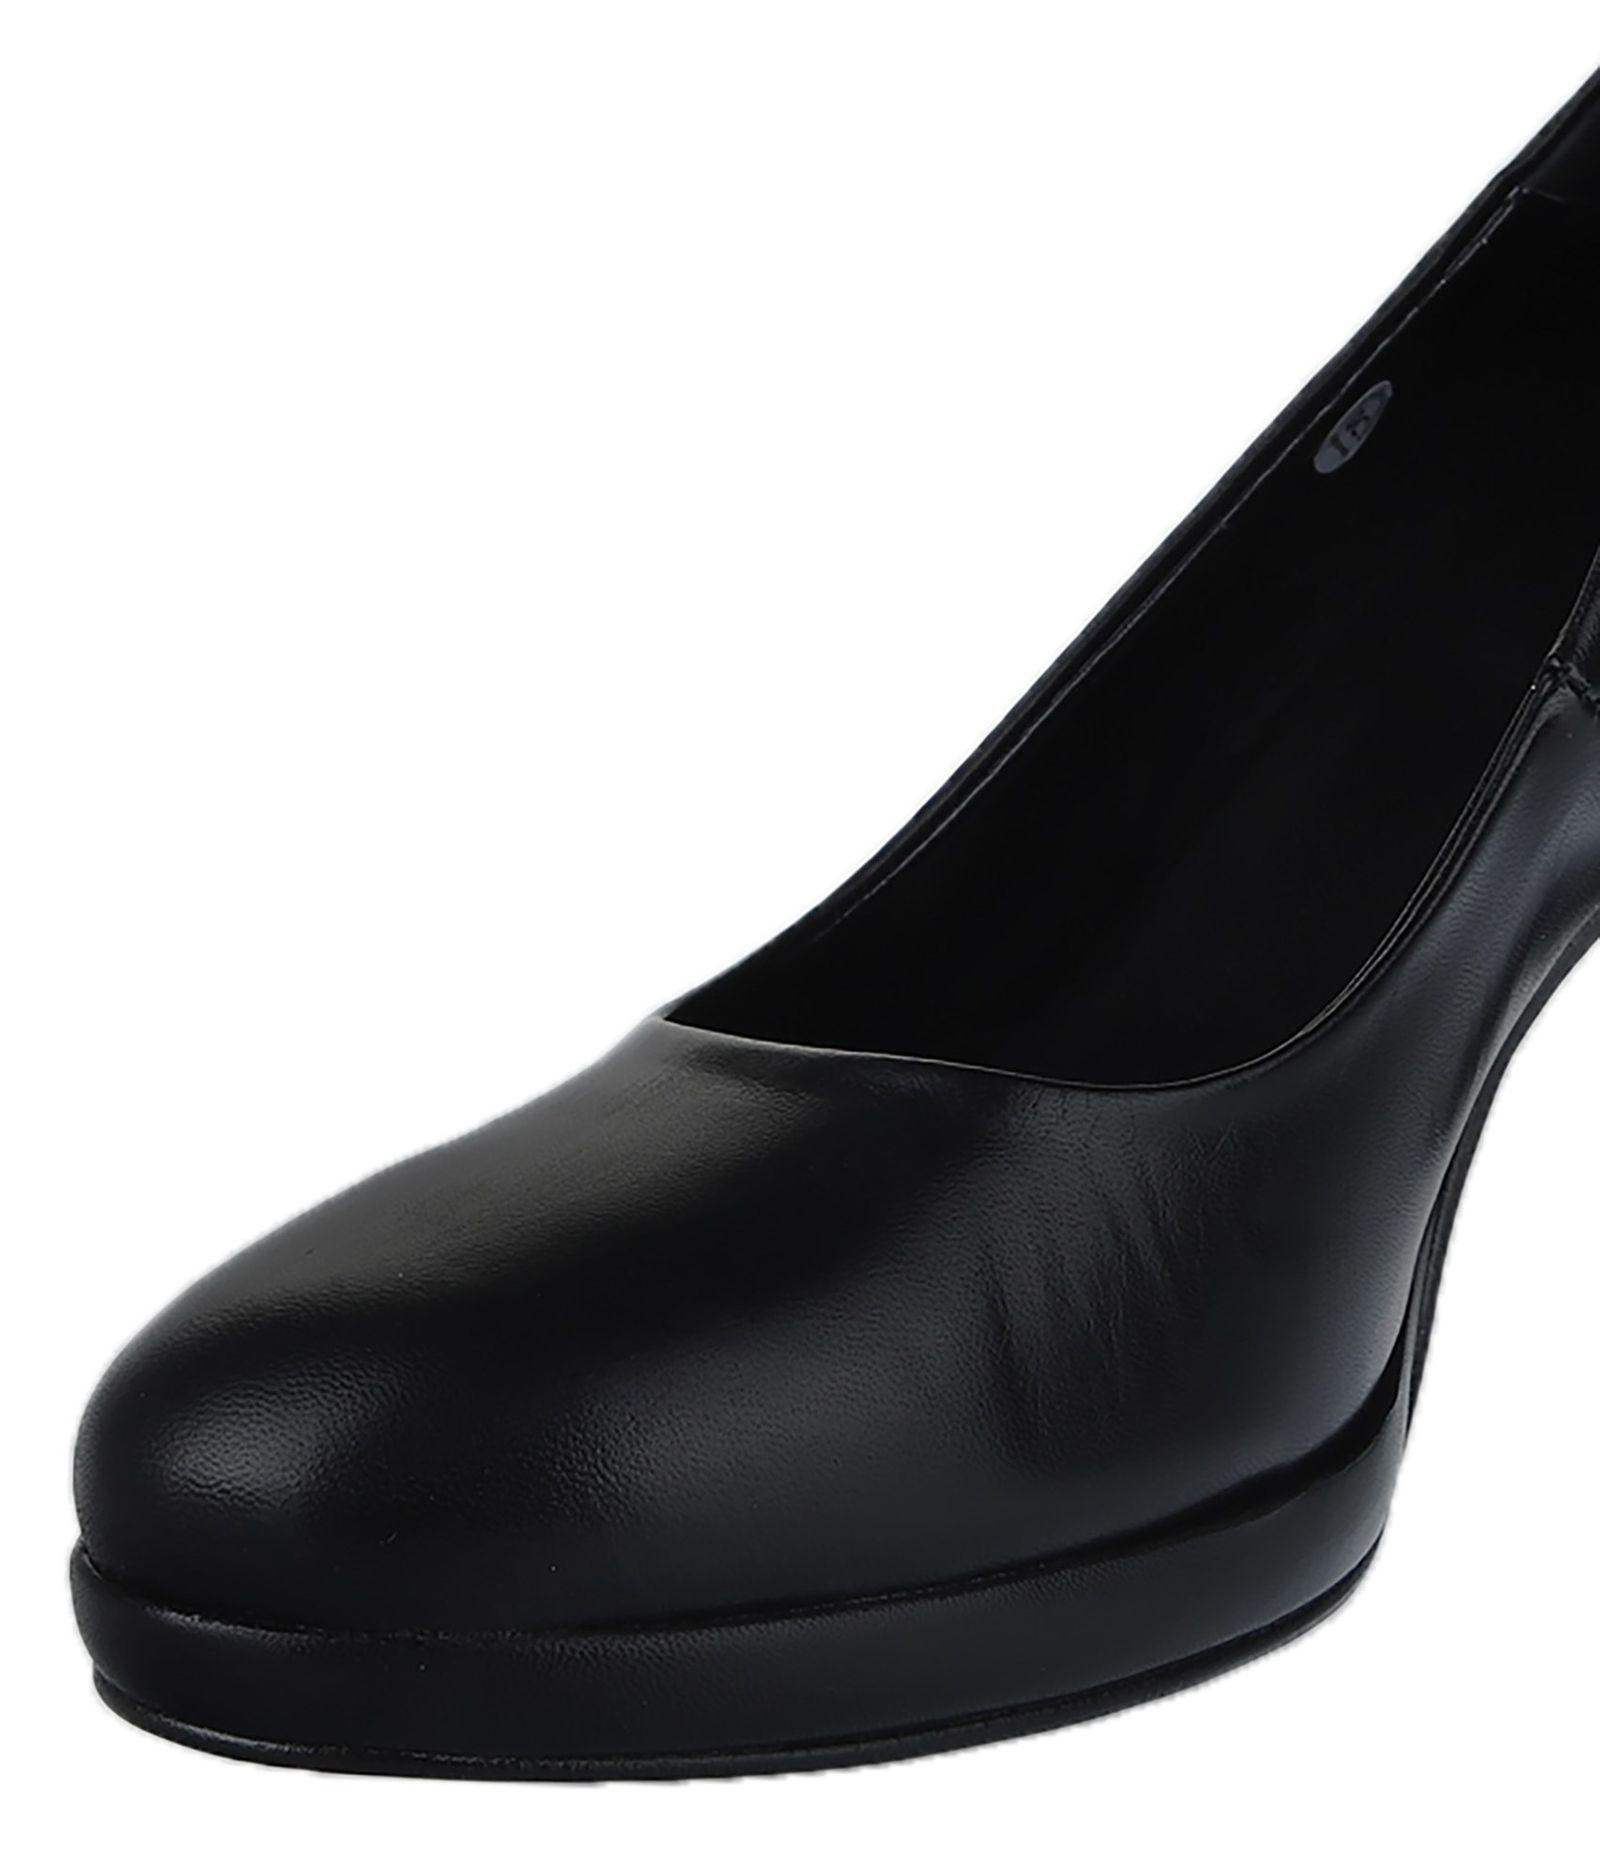 کفش چرم پاشنه بلند زنانه Julliet - دنیلی - مشکي - 3